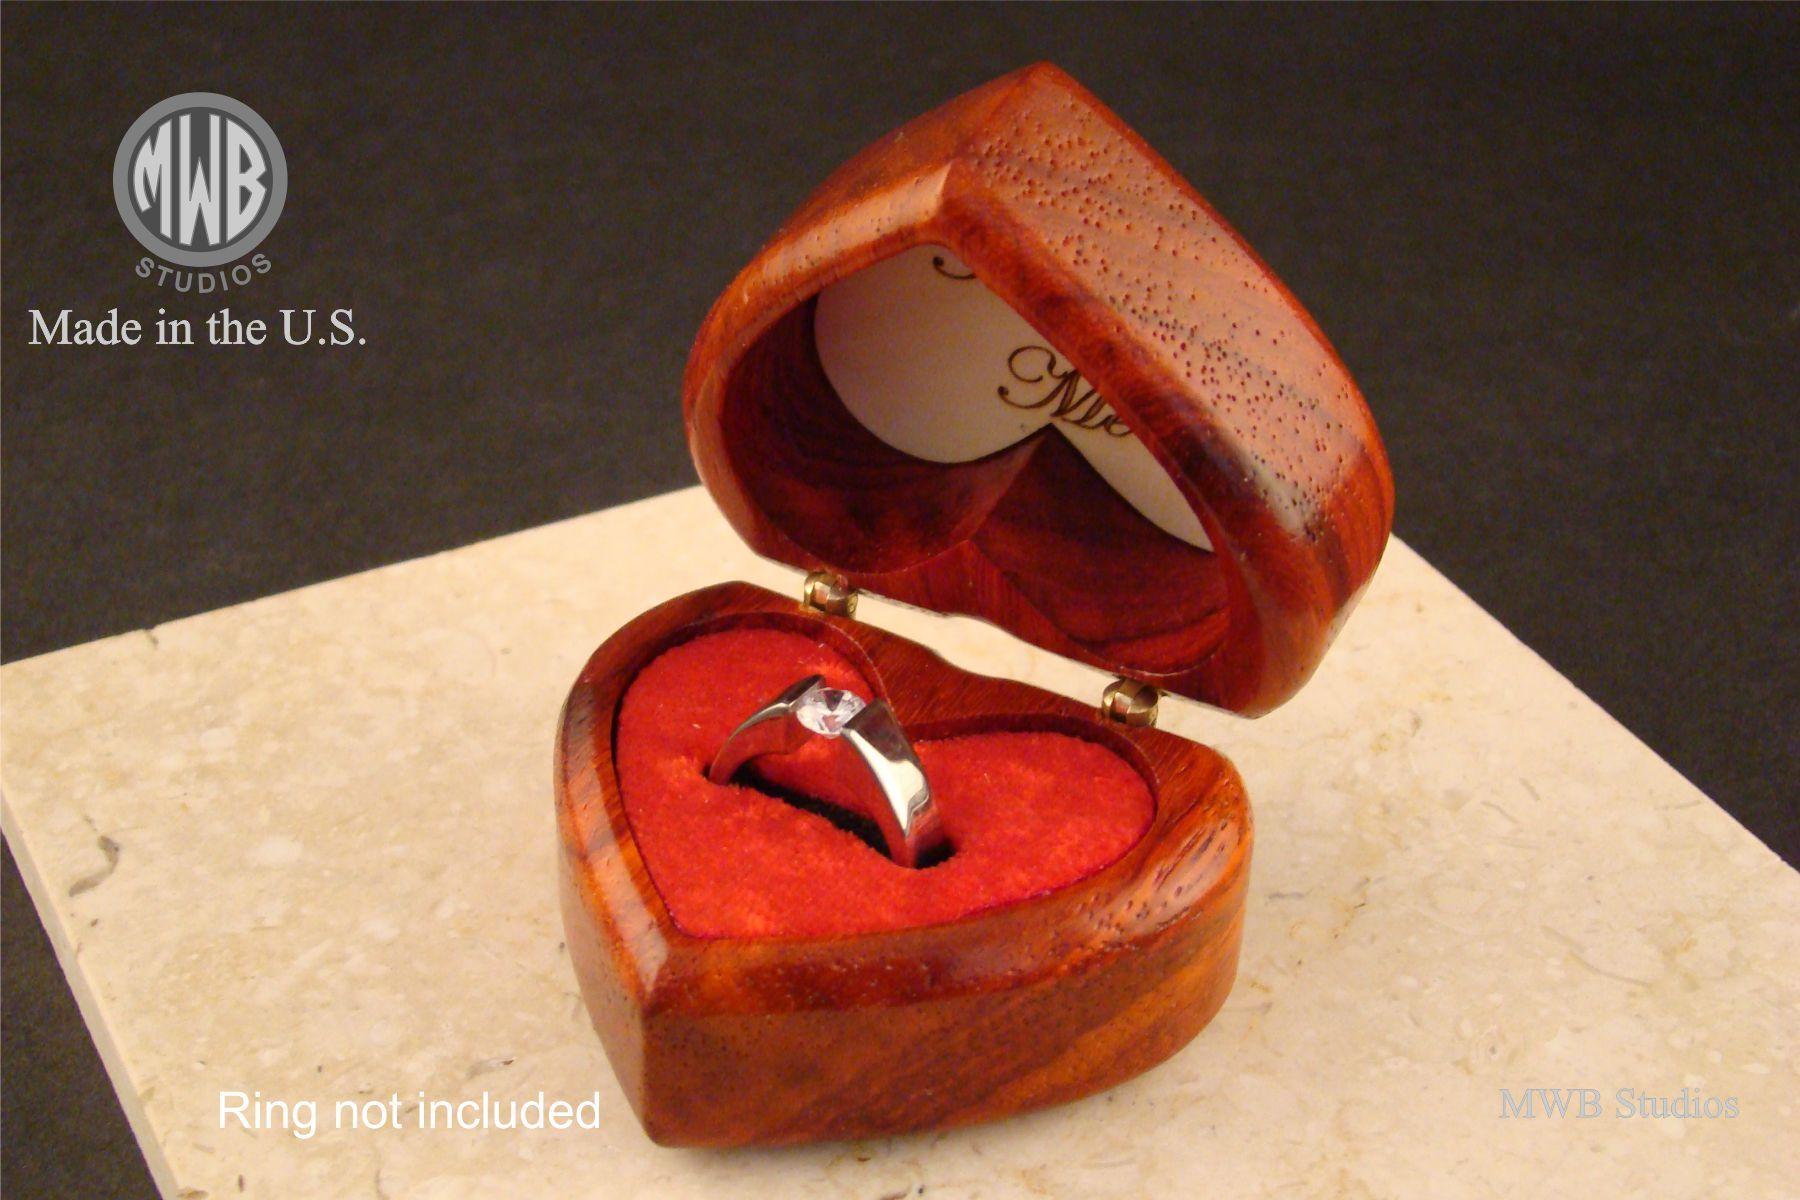 Personalised customised Acrylic Keyring Free Engraving Heart Shape Metal Ring